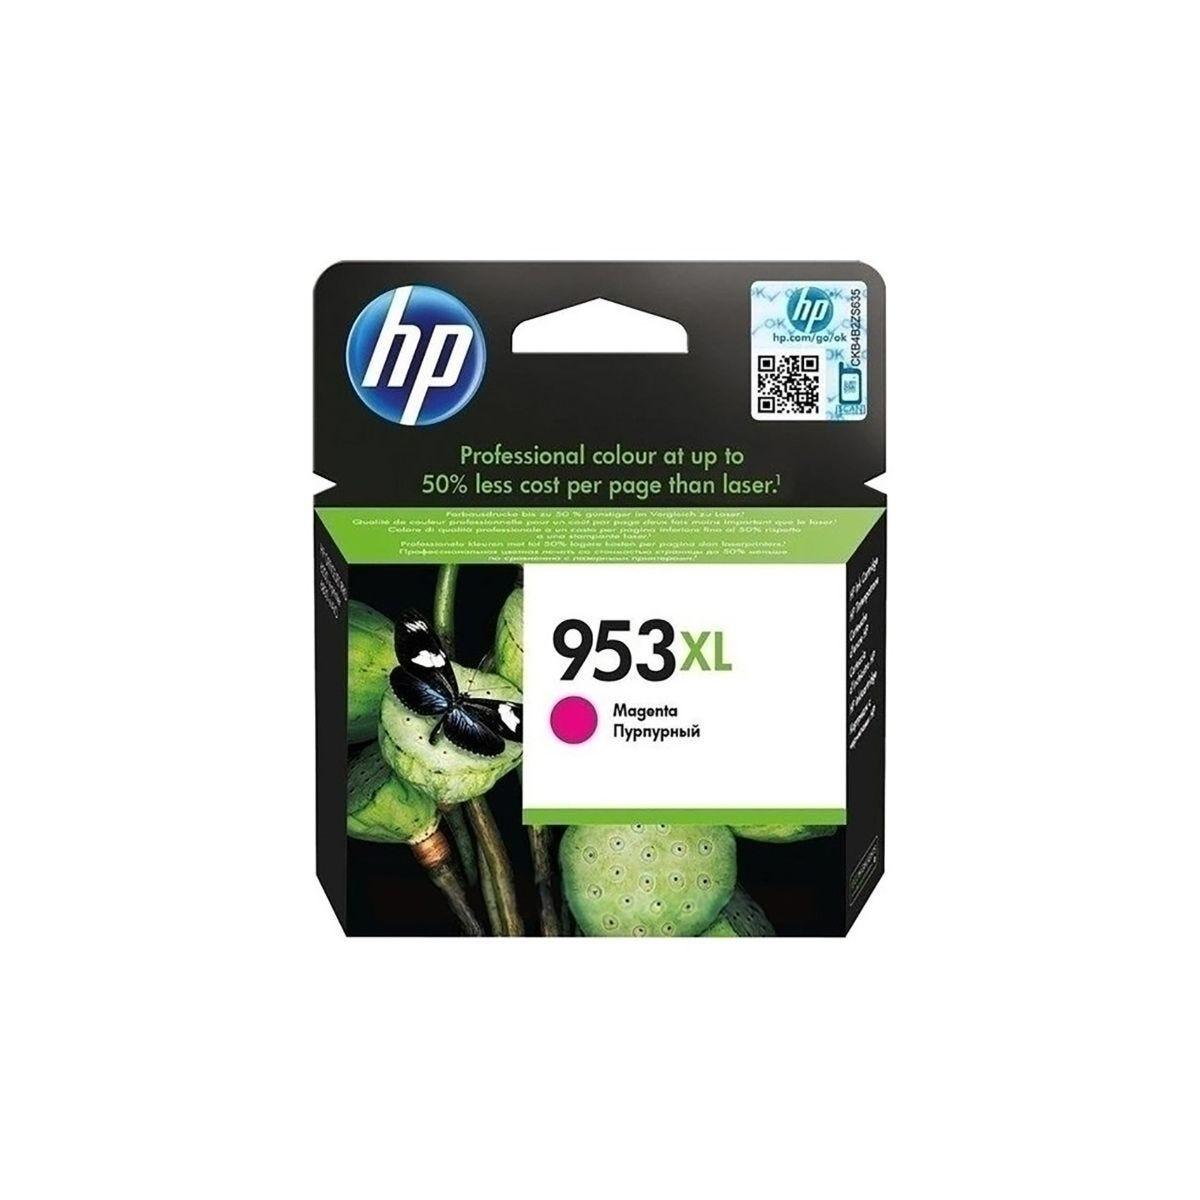 HP 953XL Ink Cartridge Magenta